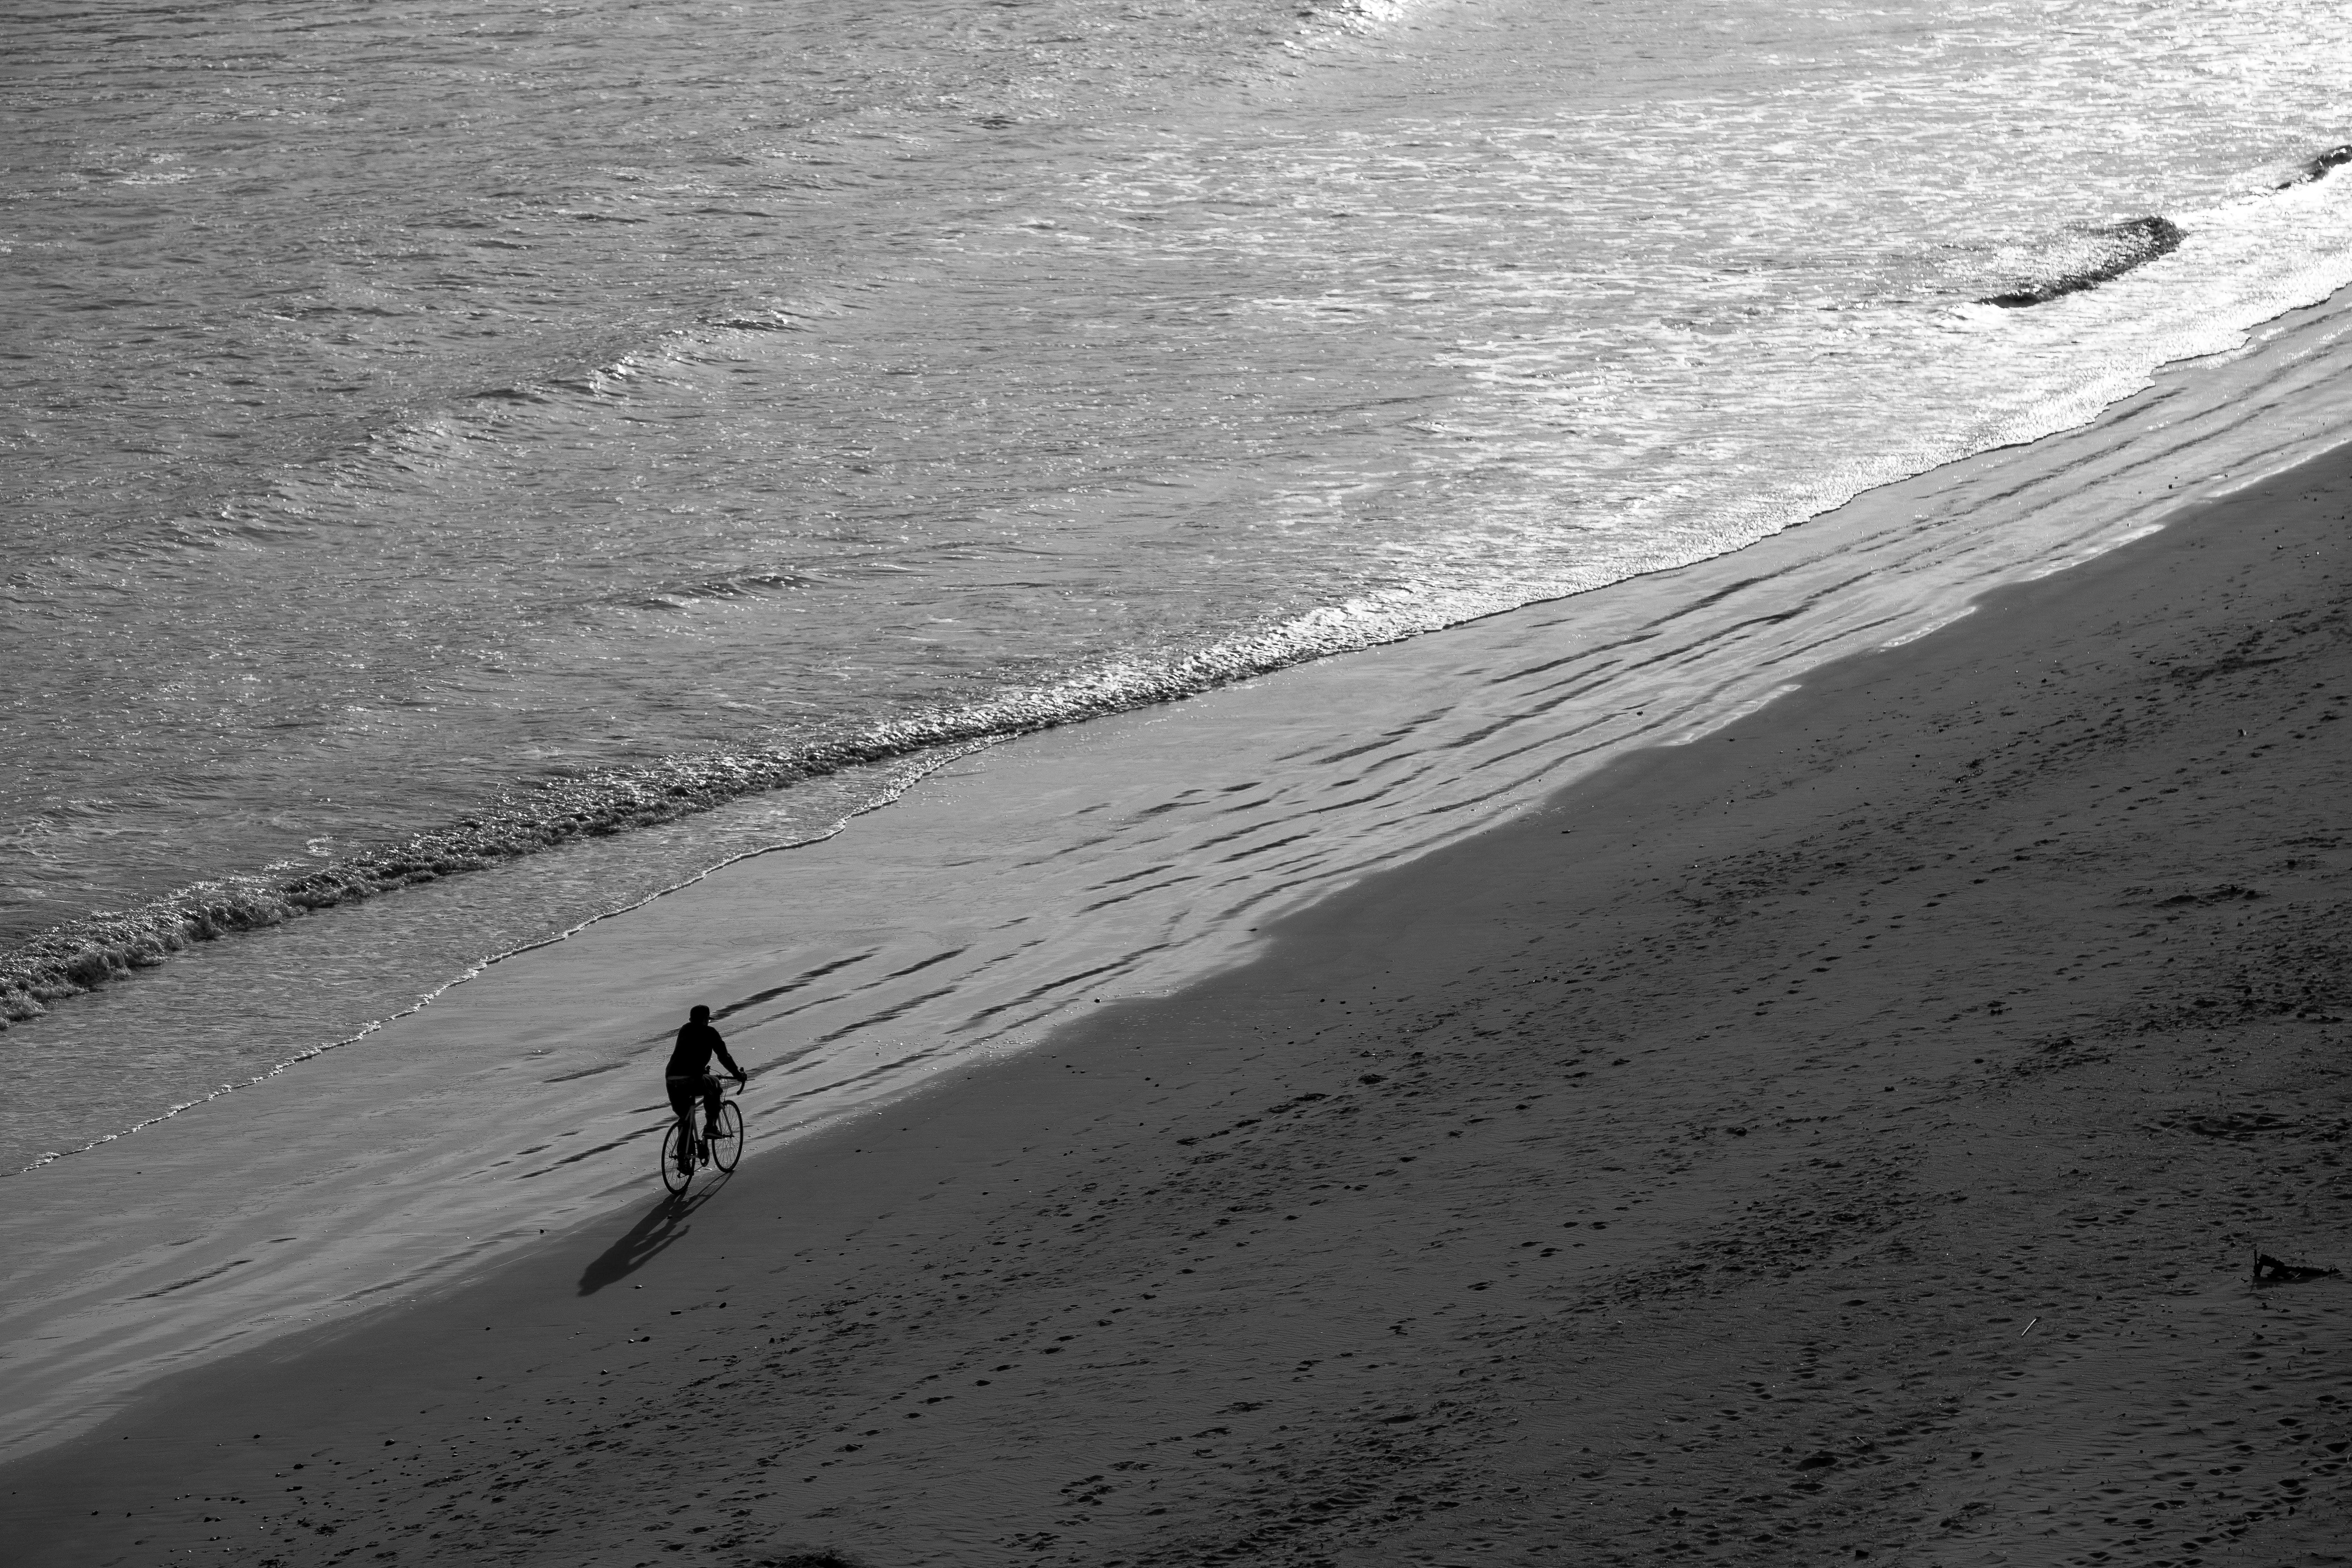 Man Riding Bike on Seashore